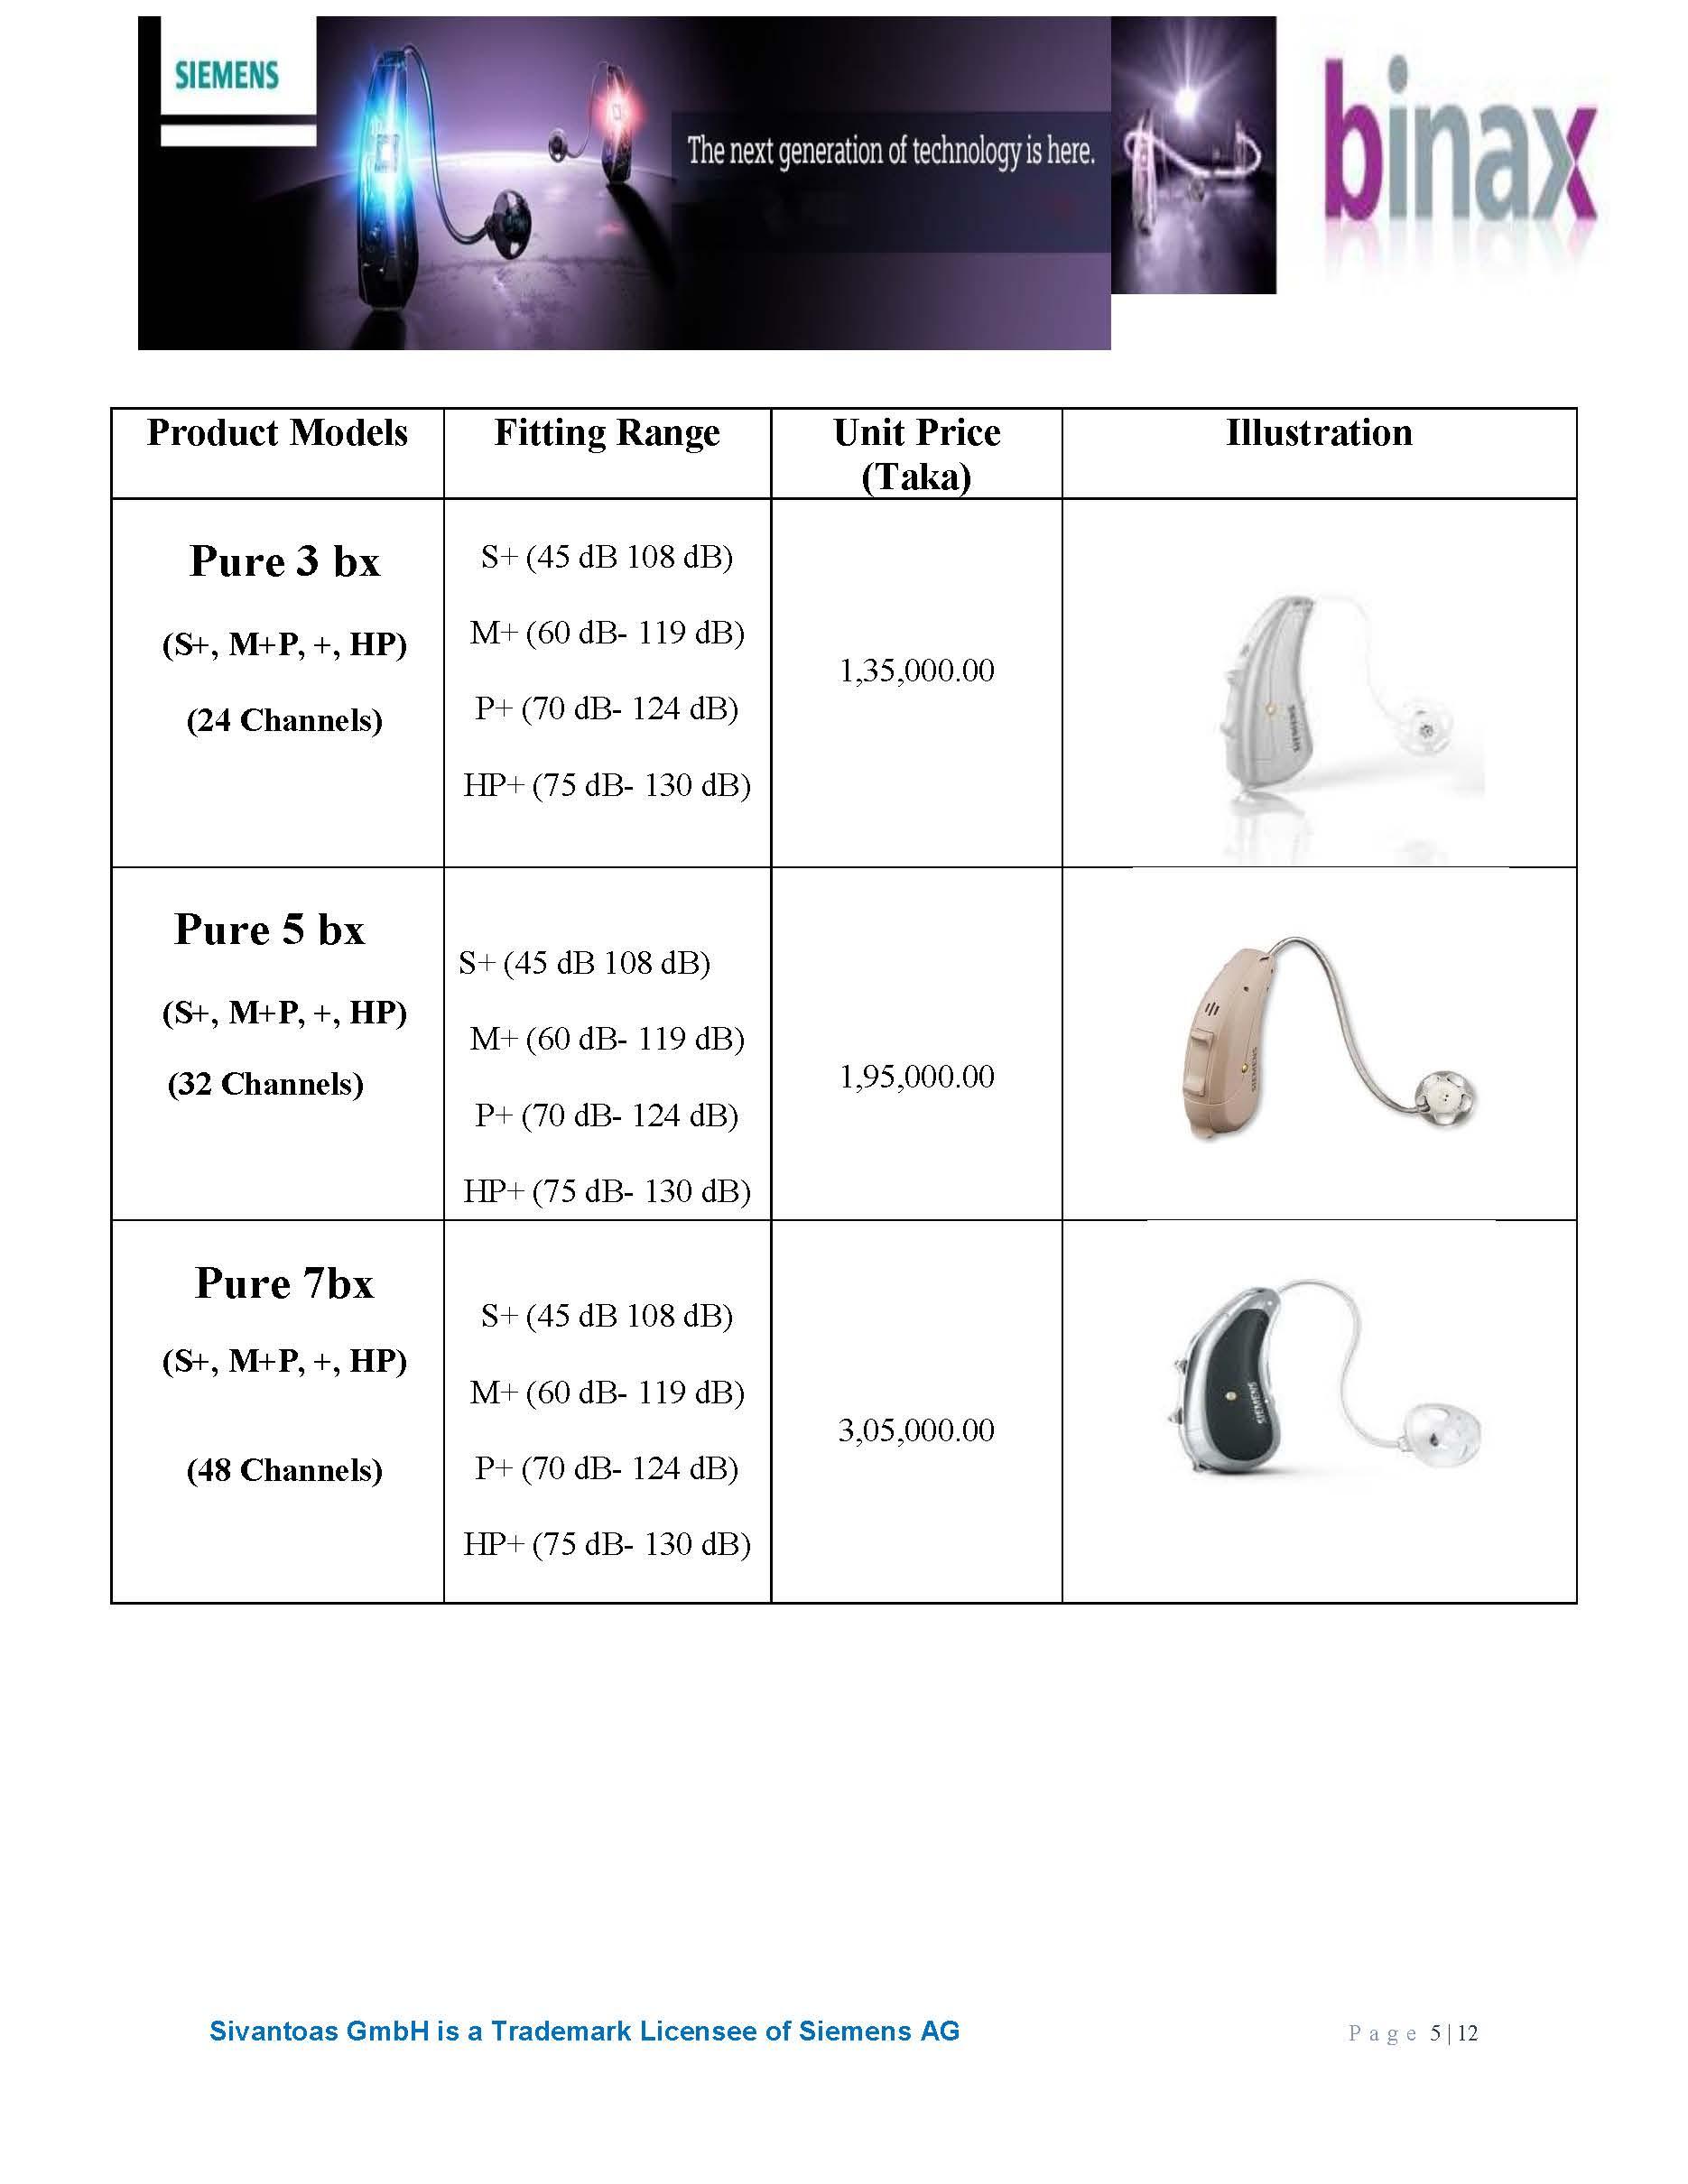 siemens hearing aid price list 2017 pdf